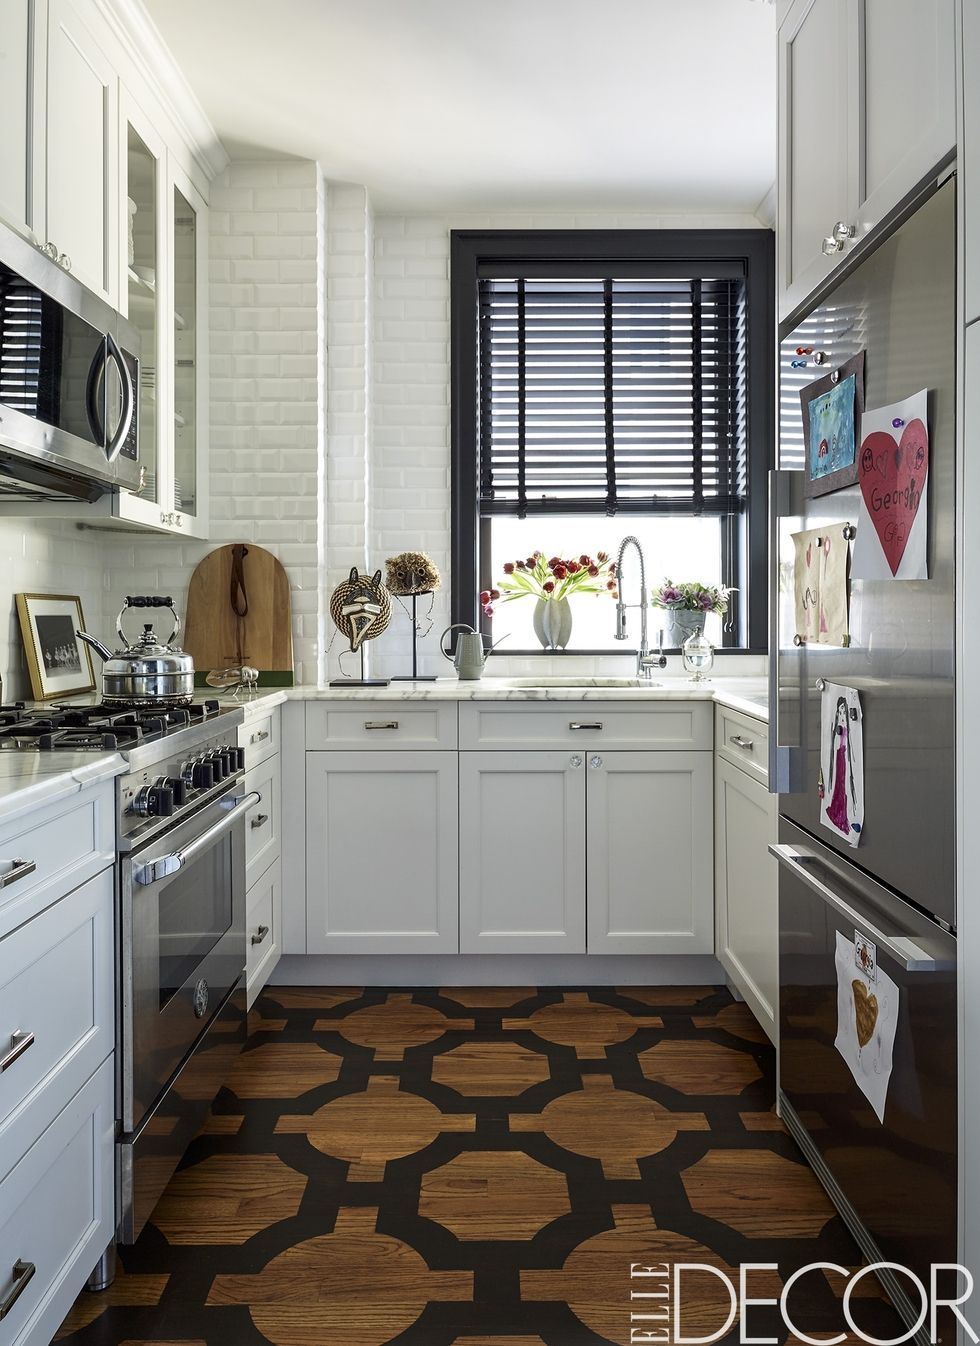 Inspiring Kitchen Design Ideas Decor